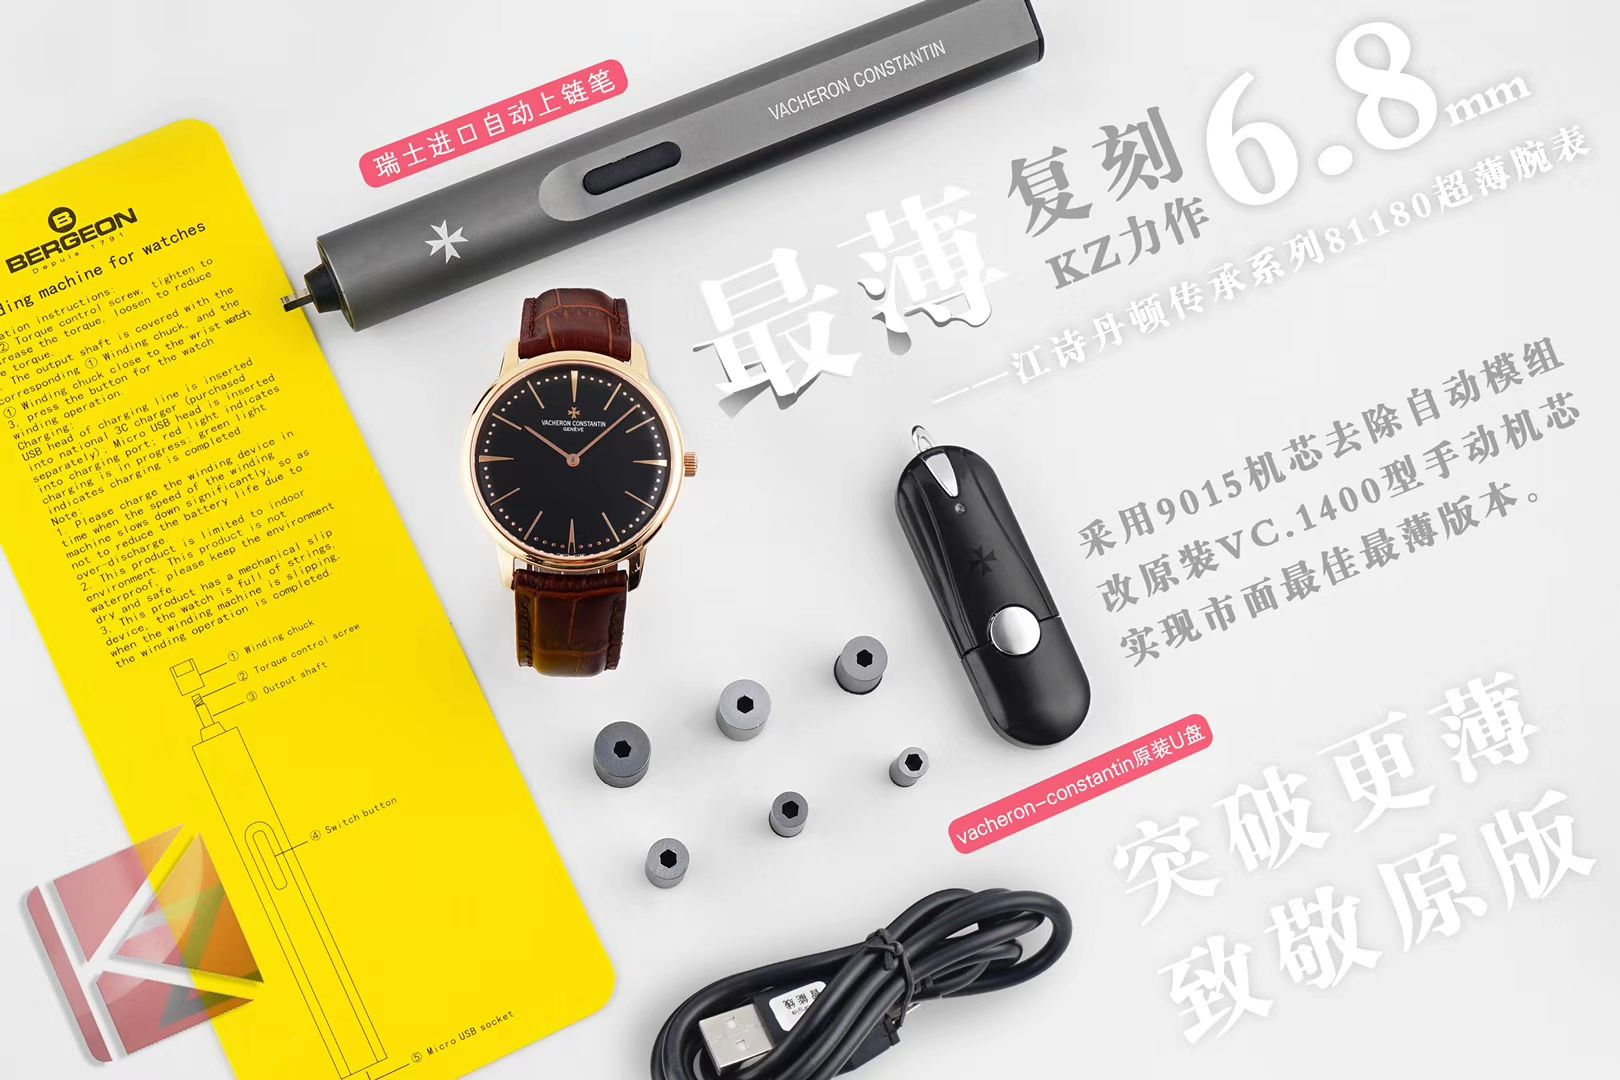 【KZ一比一超A高仿手表】江诗丹顿传承系列81180/000G-9117(白色),81180/000P-9539(深灰)腕表 / JS199